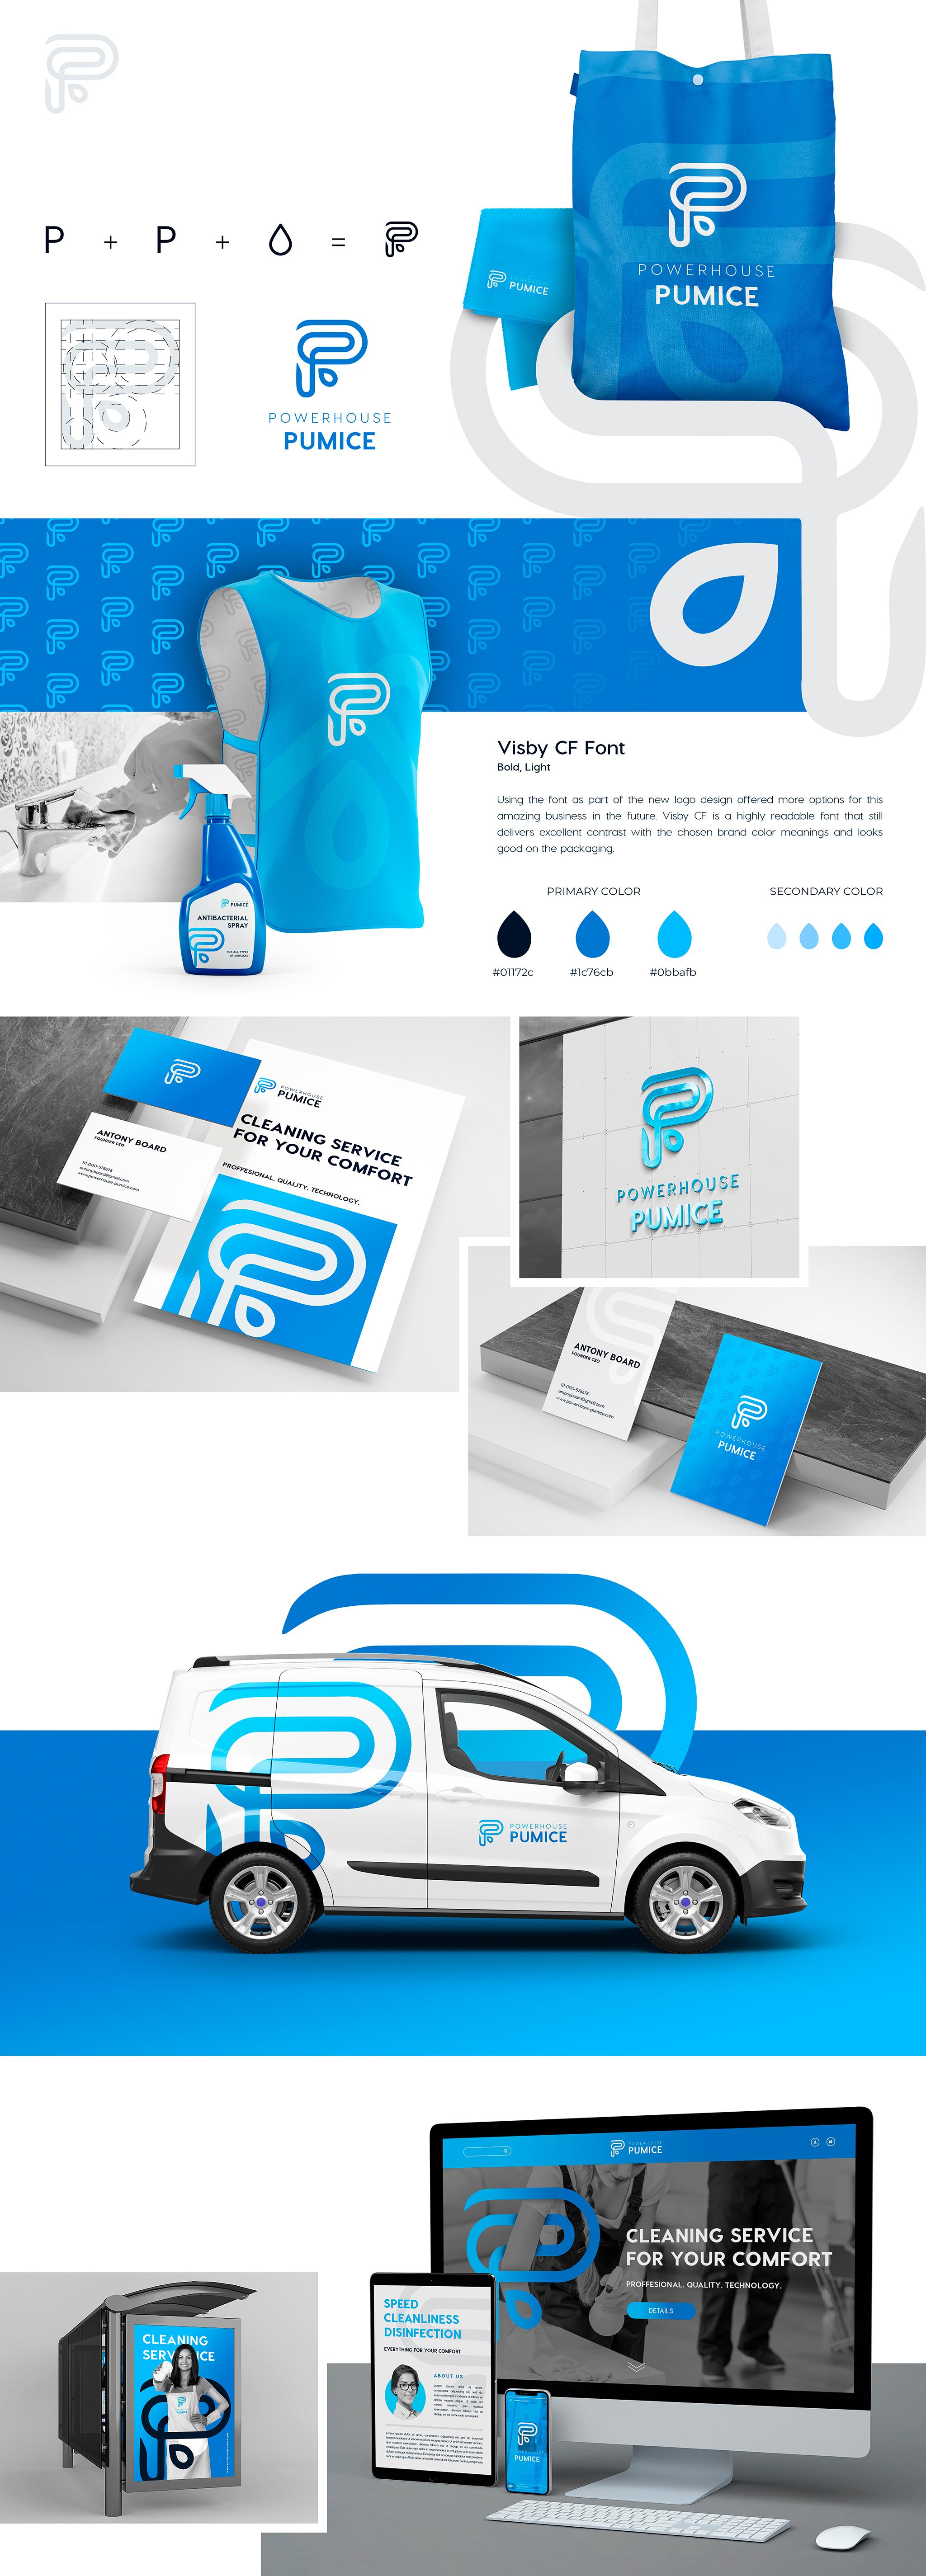 Powerhouse Pumice   Get #1 Branding Your Business   Branding Agency Branding